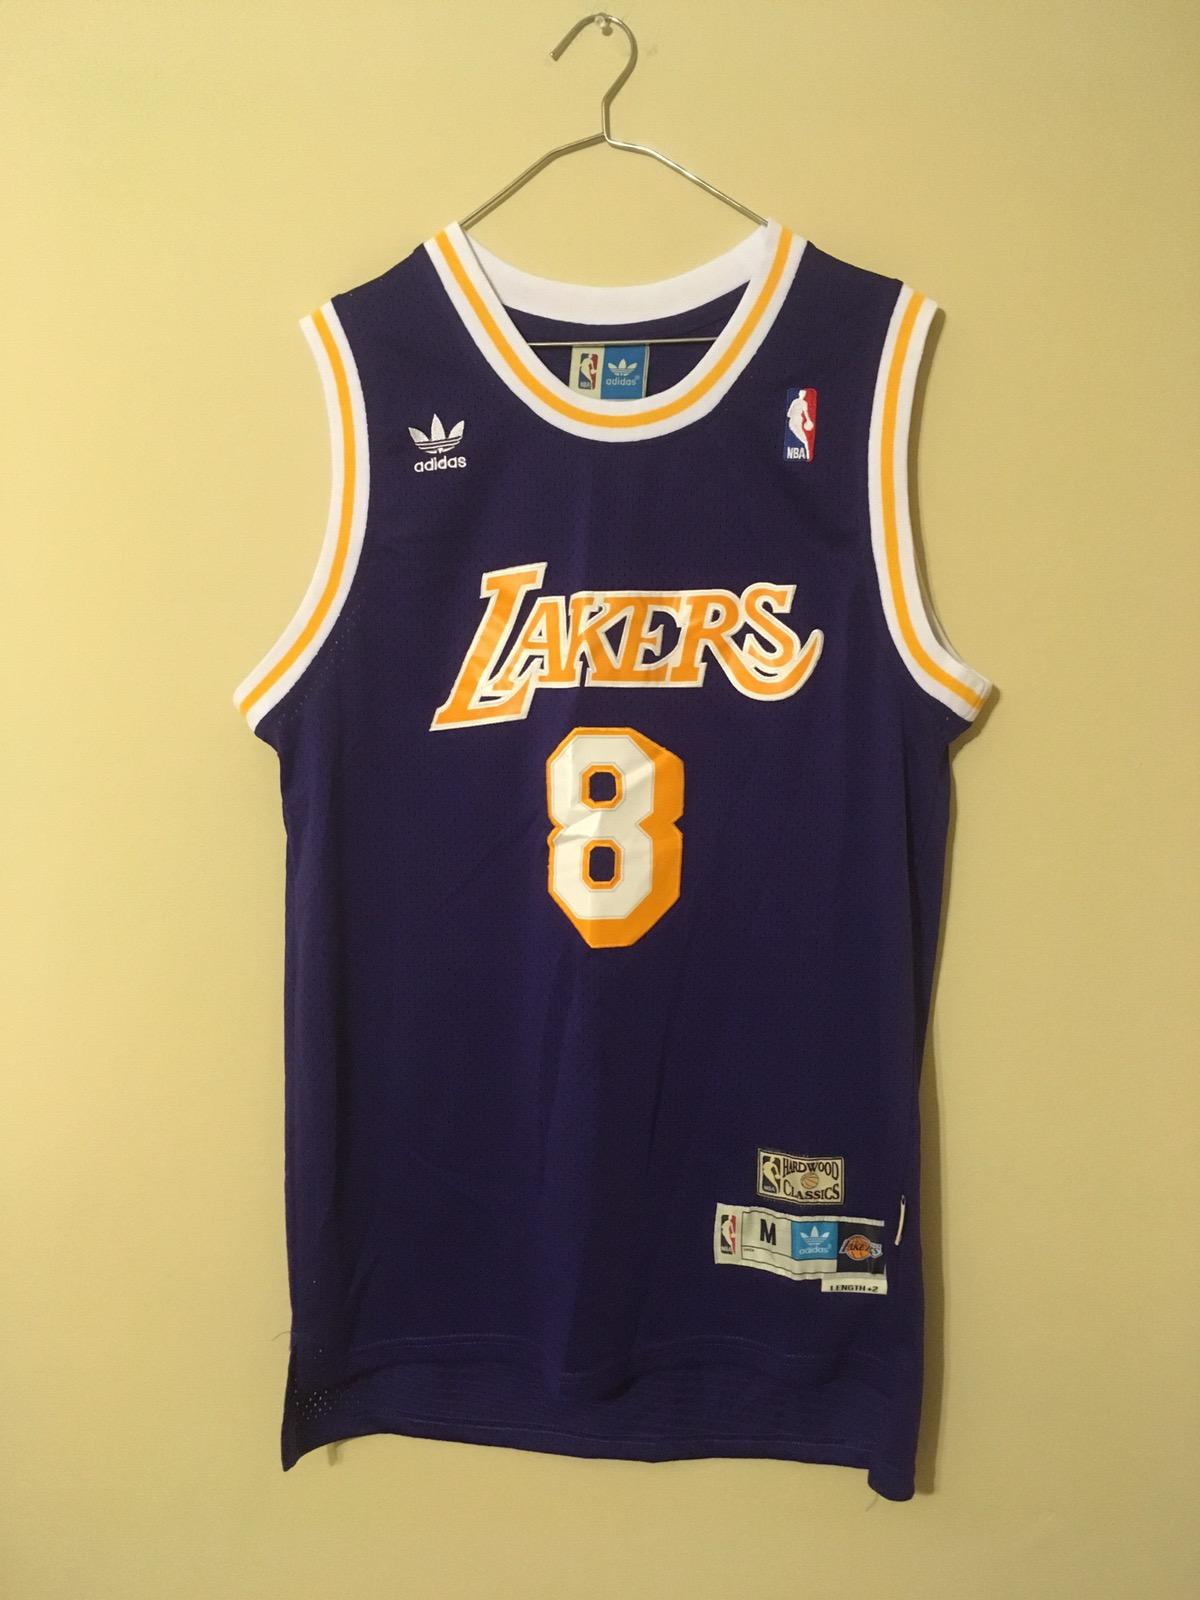 bbc3544c036 Adidas × L.A. Lakers ×. Kobe Bryant Lakers Jersey. Size  US M   EU 48-50   2